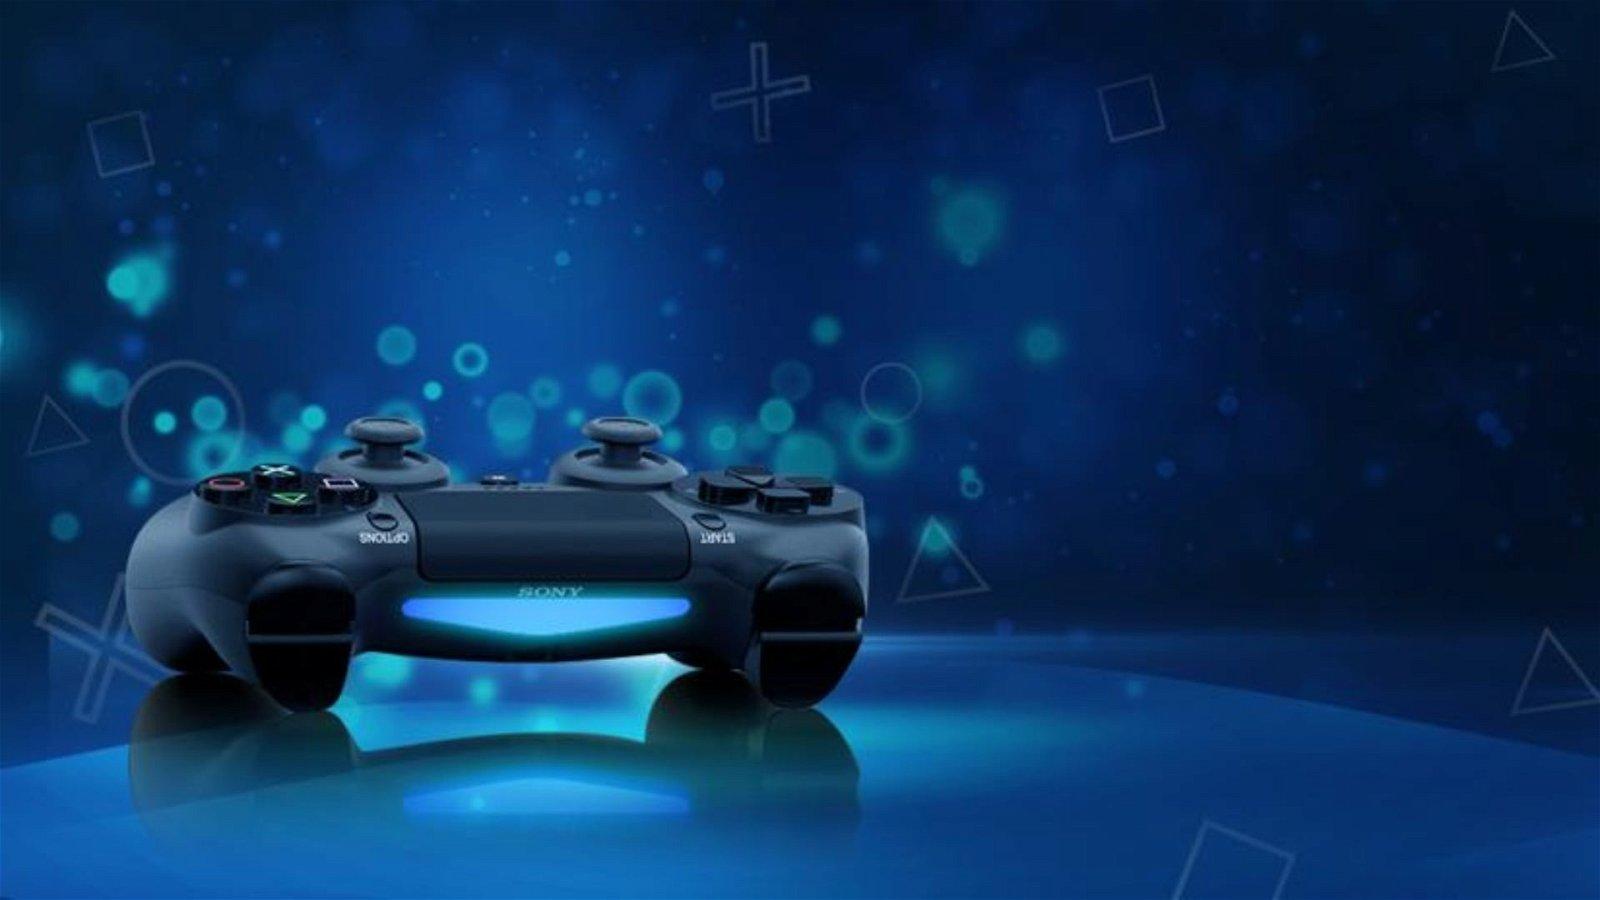 Sony's PlayStation 5 Revealed Alongside 2020 Release